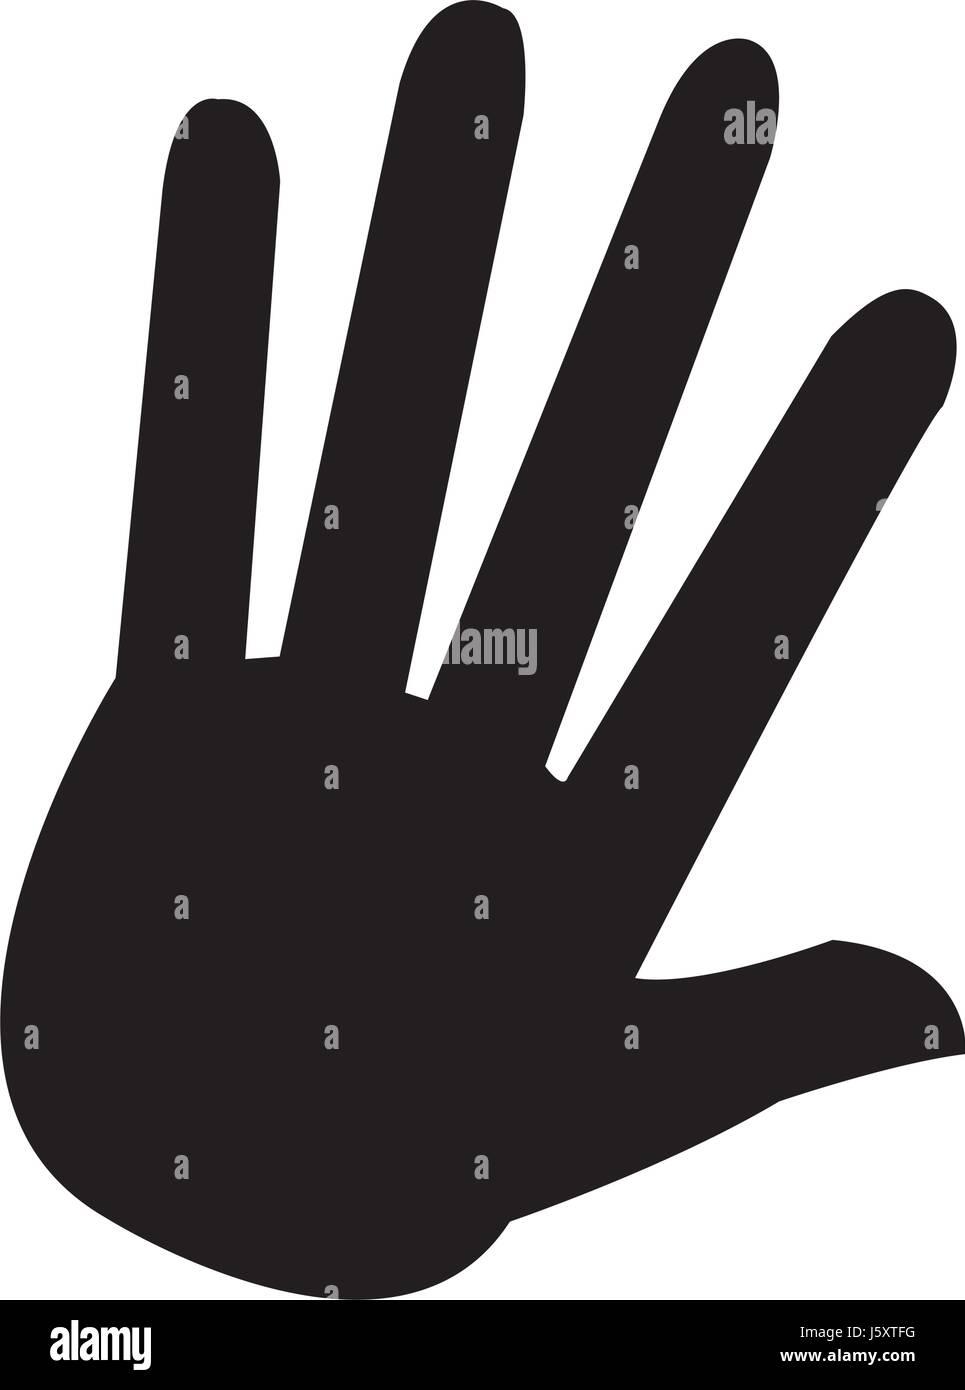 Hand Palm Human Symbol Pictogram Stock Vector Art Illustration